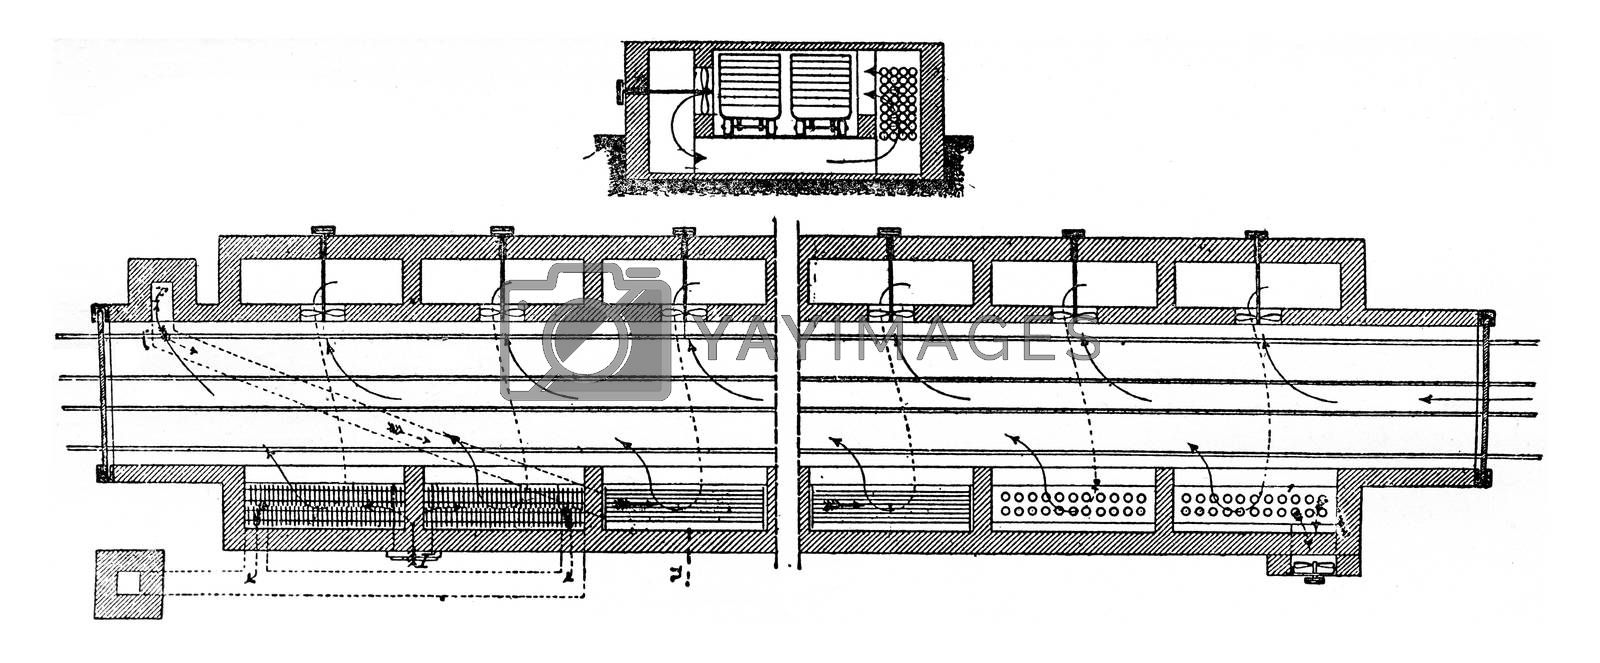 Dryer Moeller and Pfeiffer, vintage engraved illustration. Industrial encyclopedia E.-O. Lami - 1875.